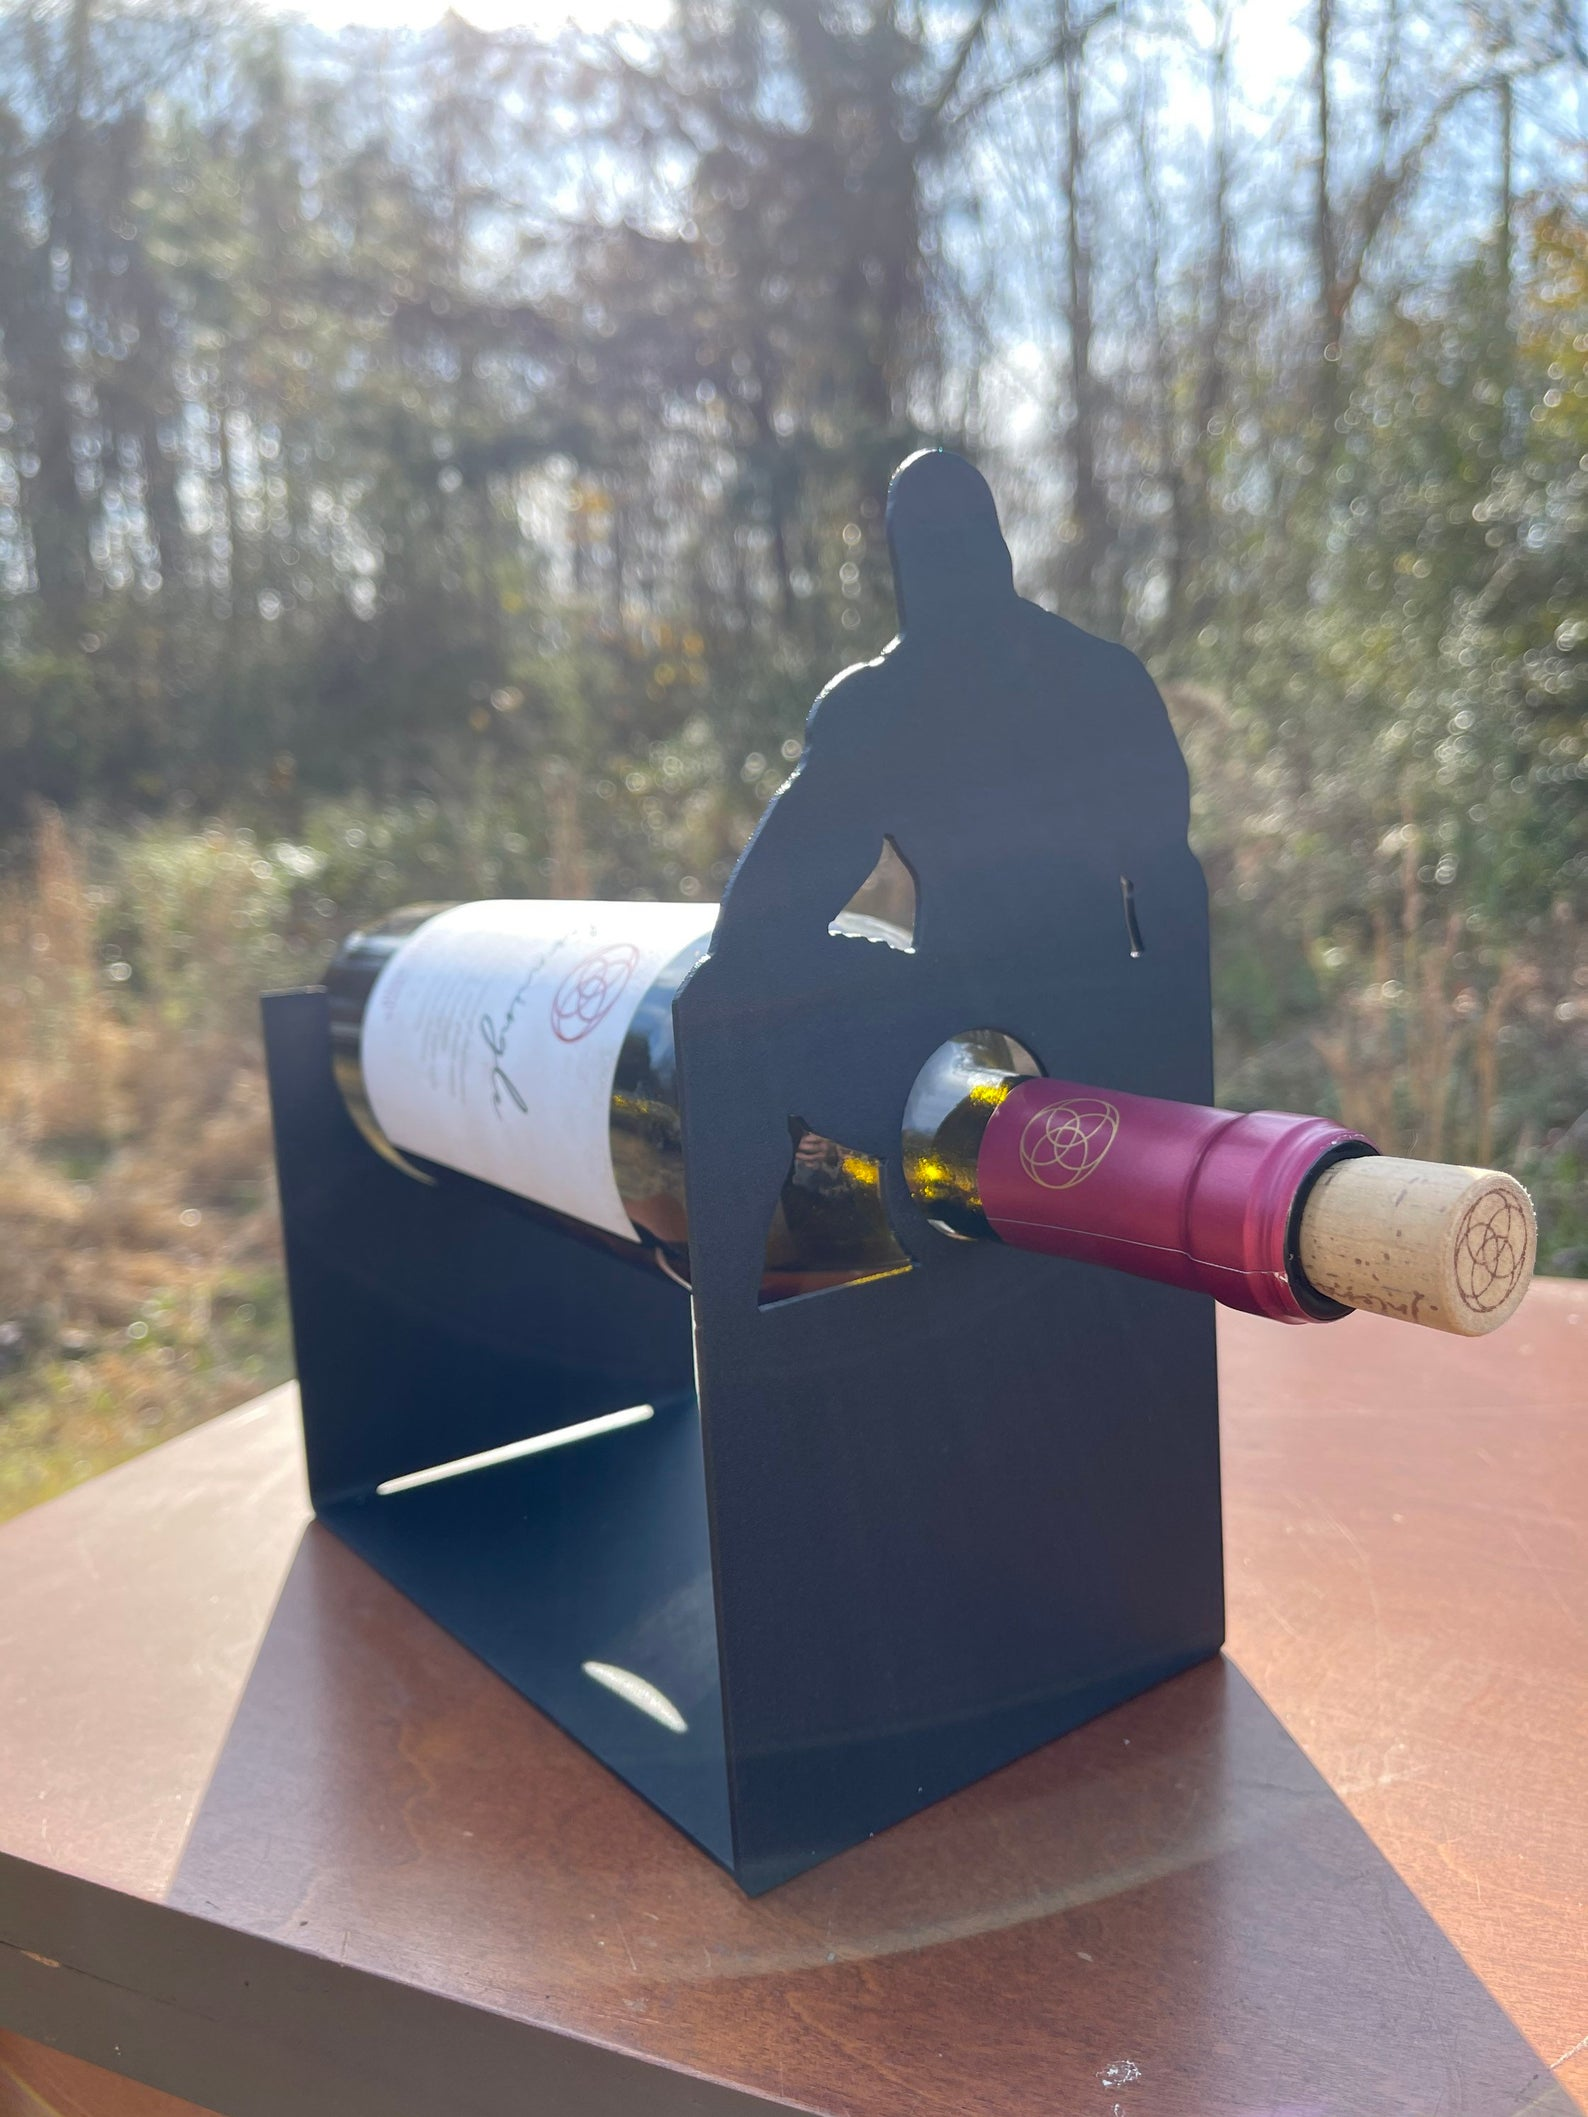 Wine bottle holder (Barry Wood tribute)